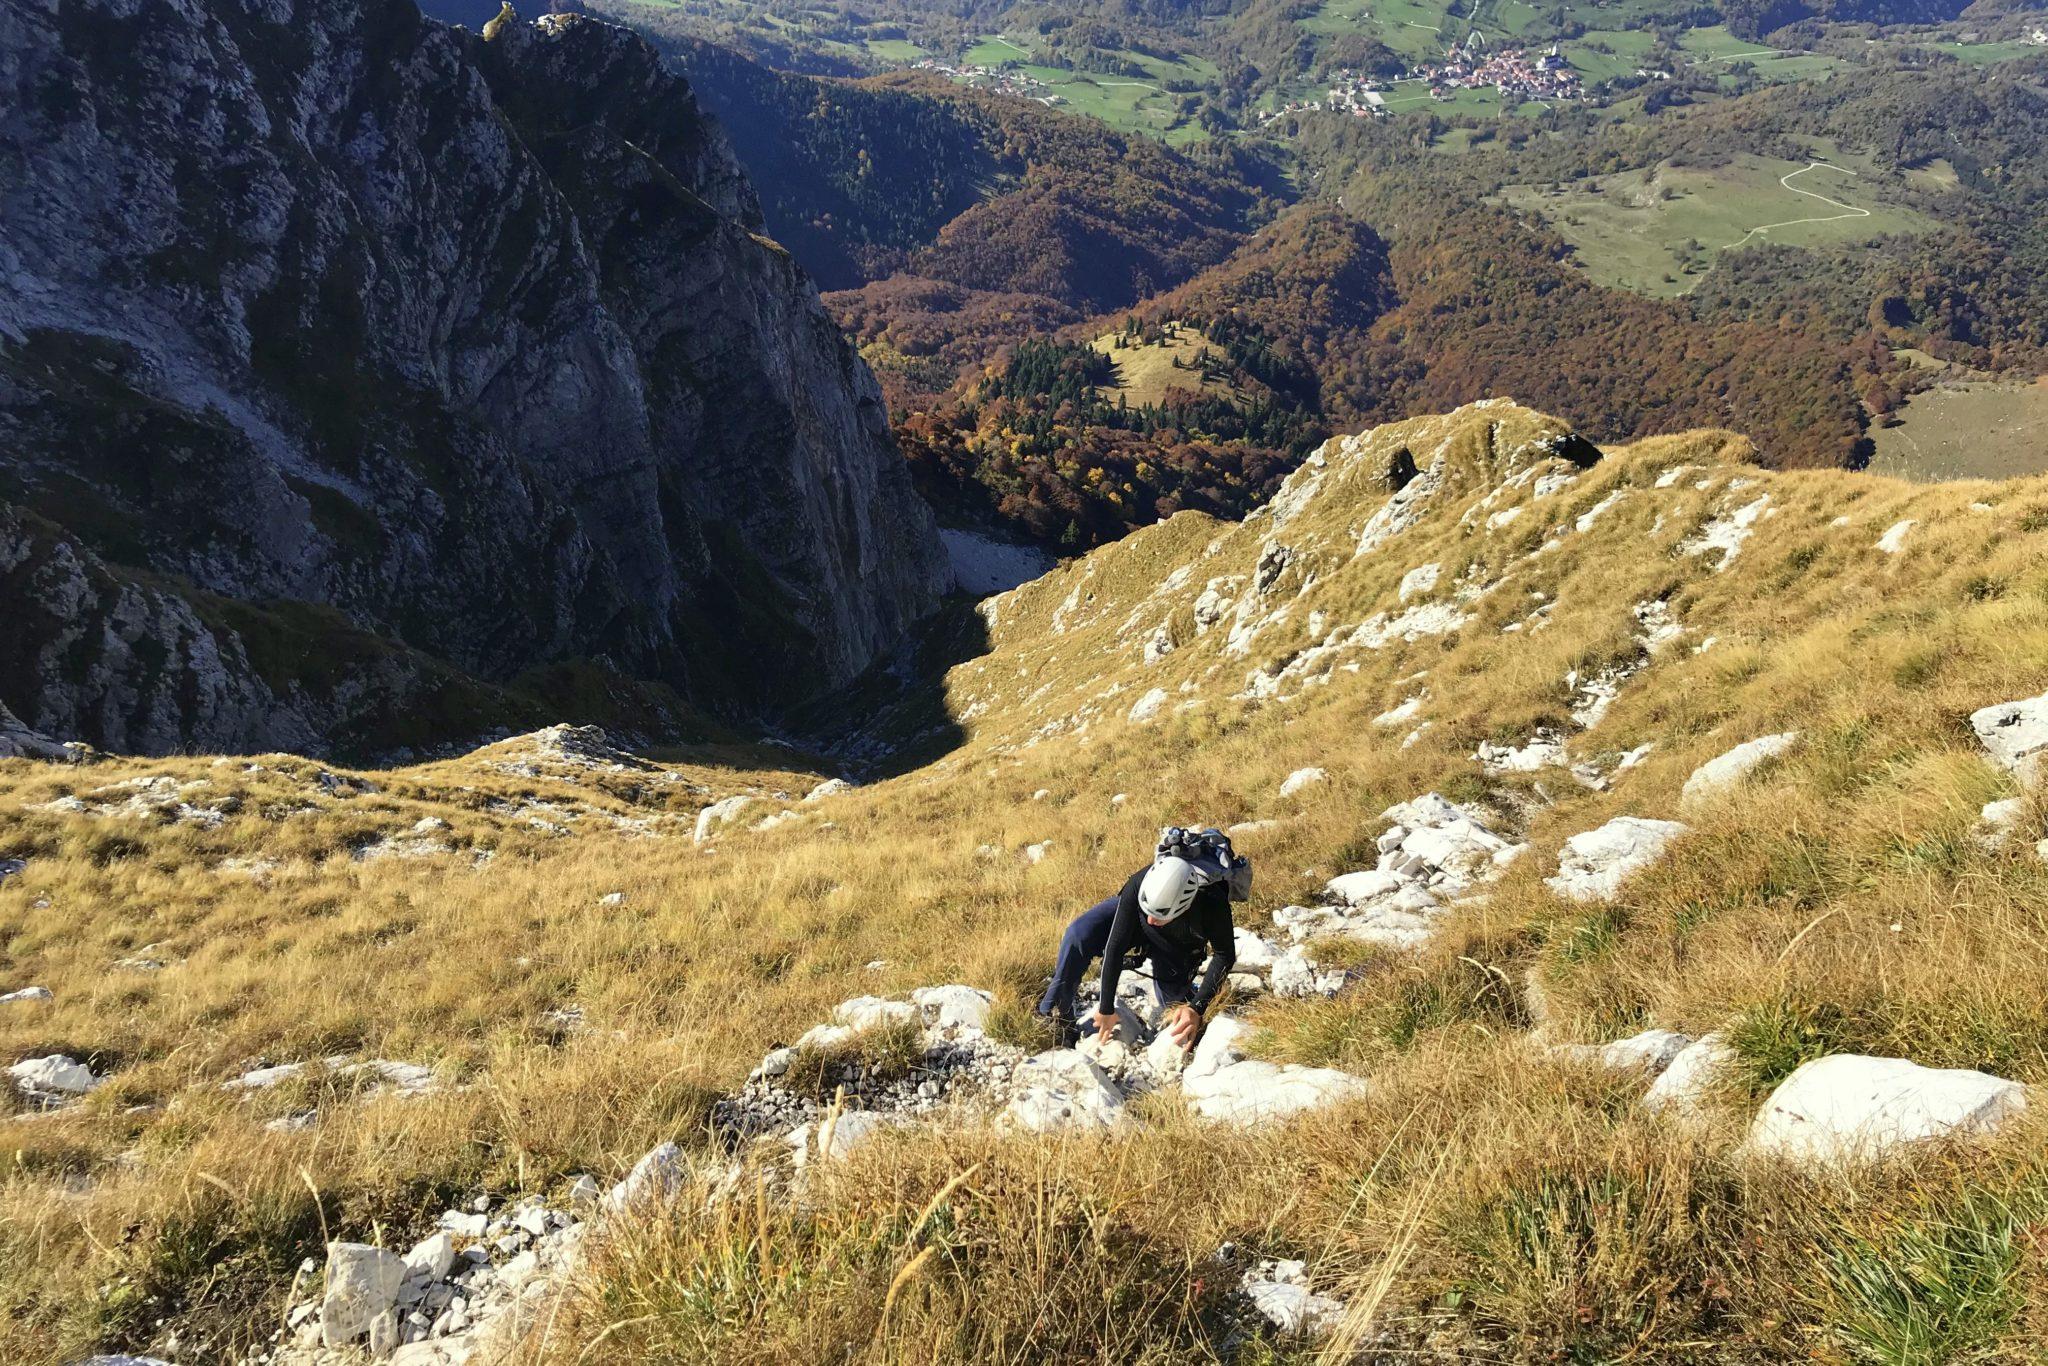 Climbing the Silvo Koren to Mt. Krn, Slovenia